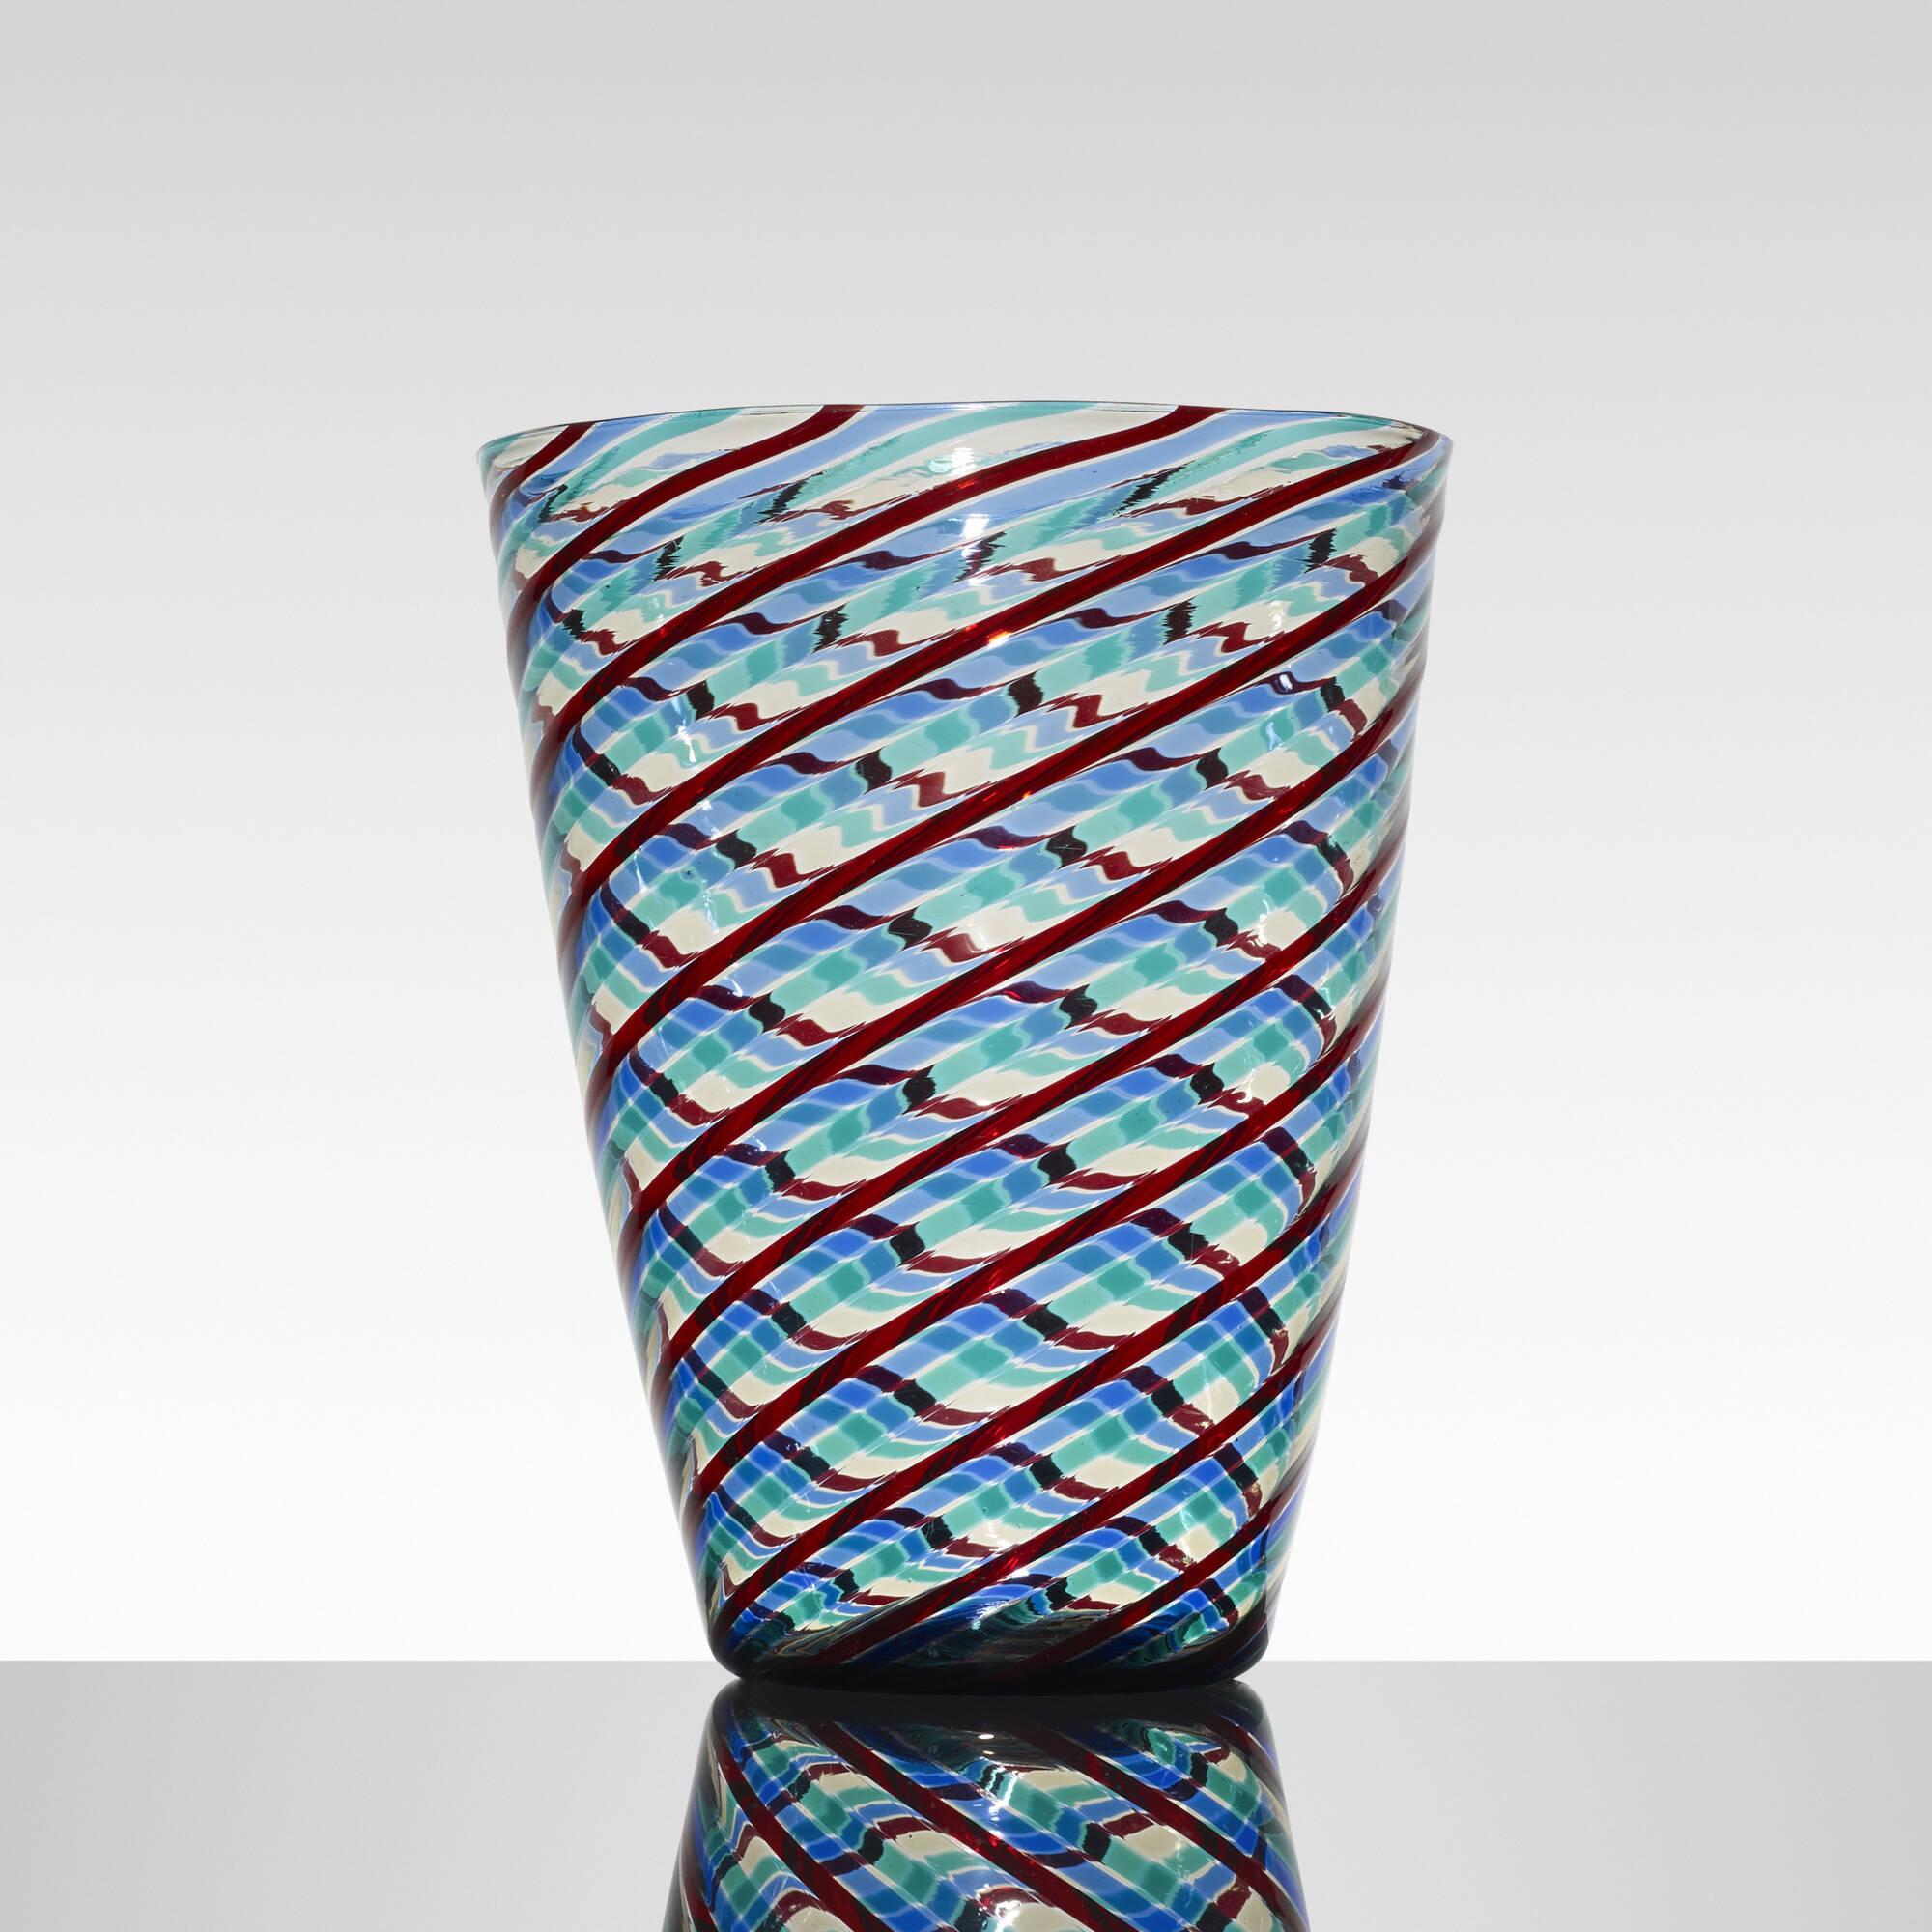 145: Fulvio Bianconi / a Fasce Ritorte vase (1 of 2)